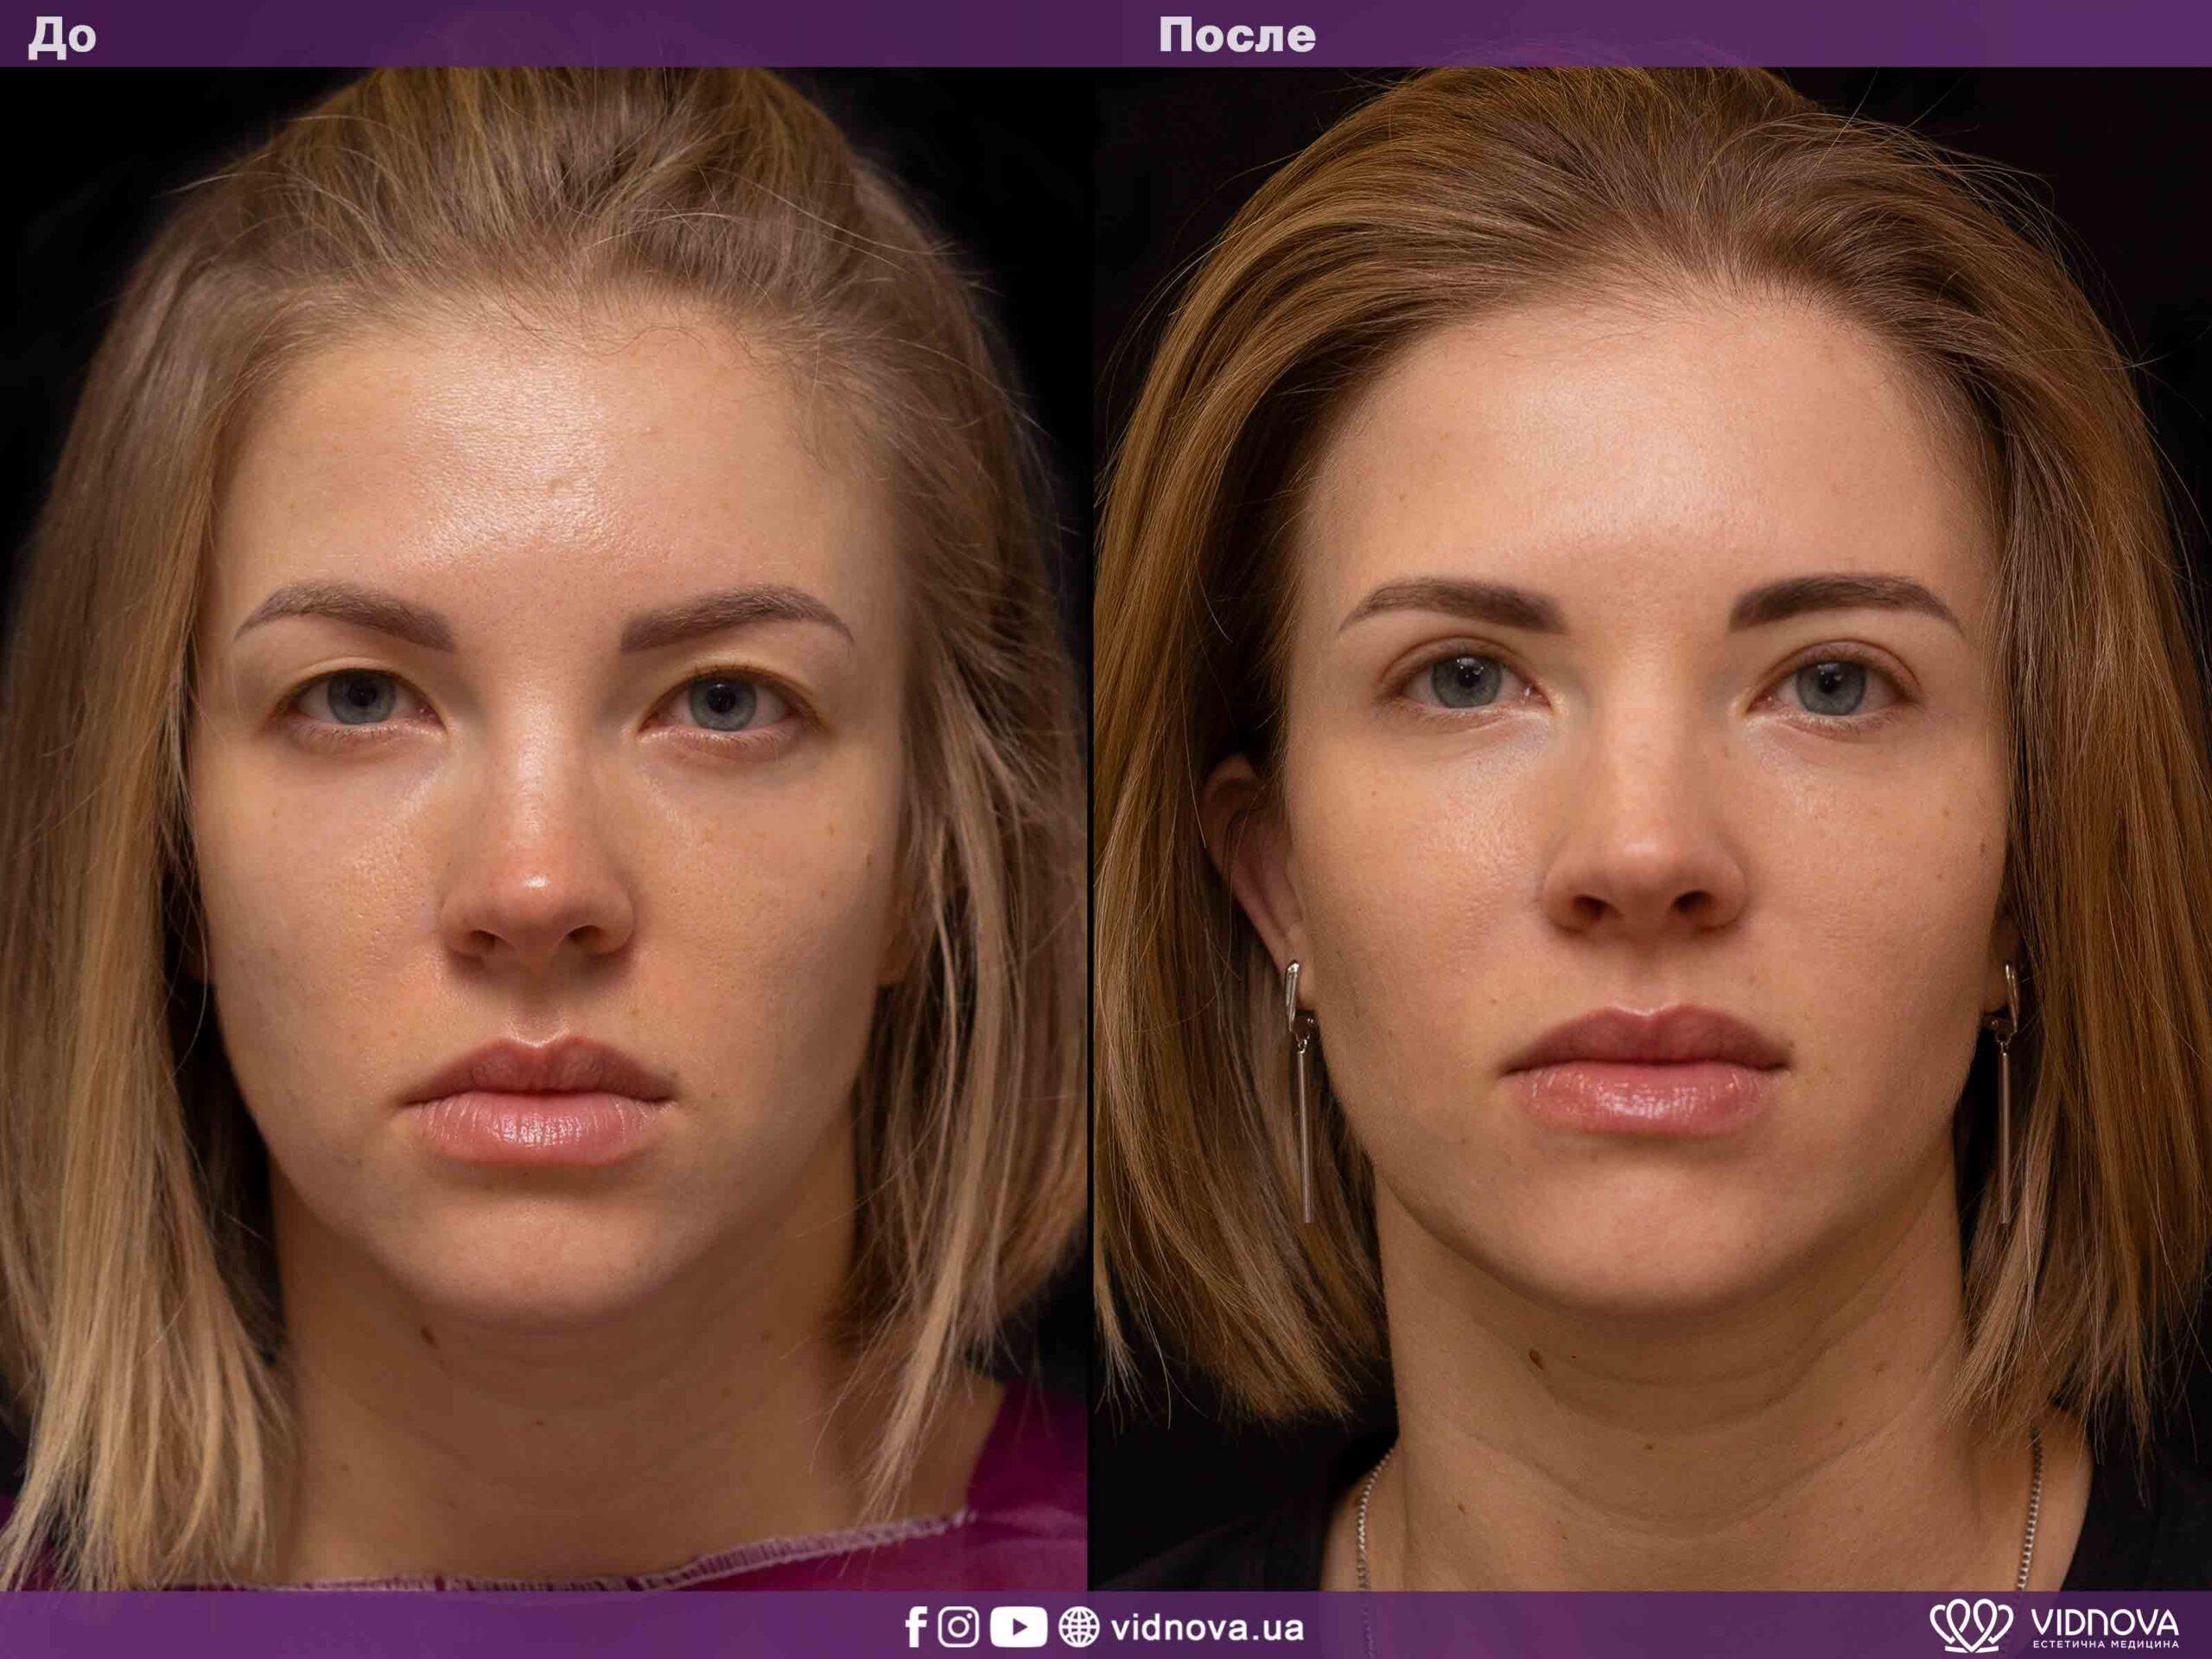 Блефаропластика: Фото До и После - Пример №6-1 - Клиника Vidnova